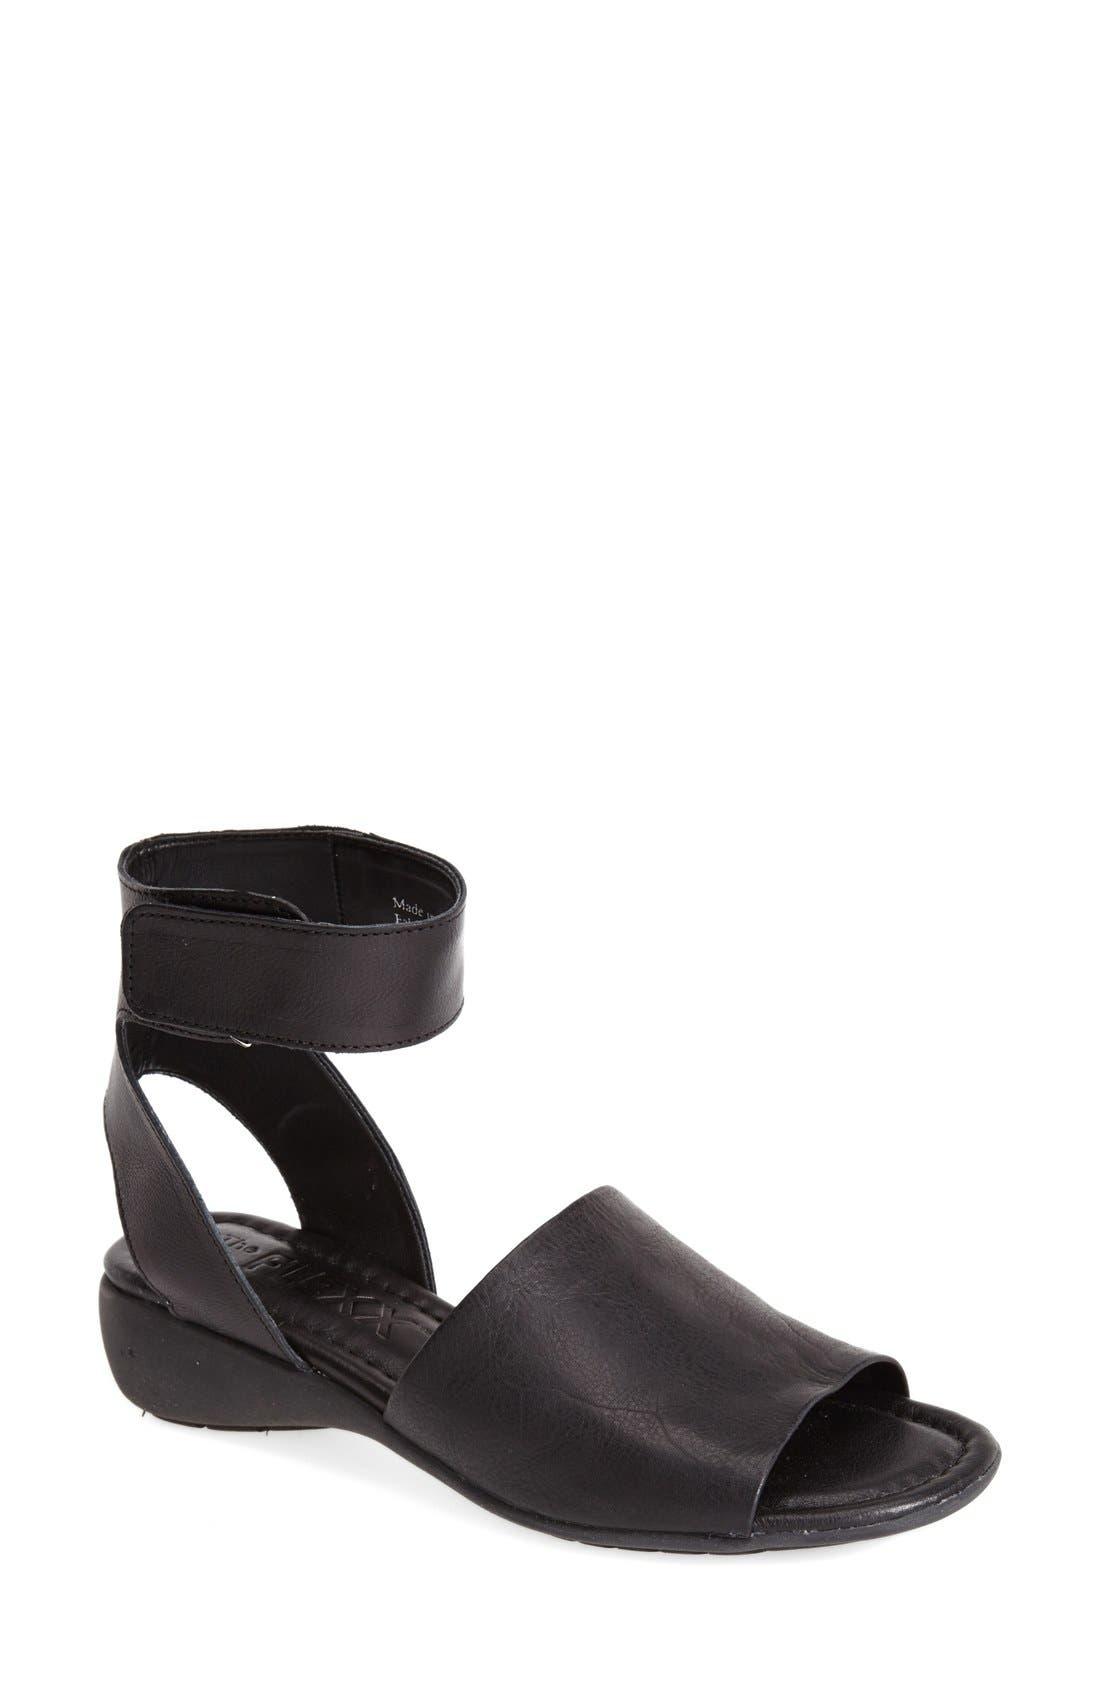 'Beglad' Leather Ankle Strap Sandal,                             Main thumbnail 6, color,